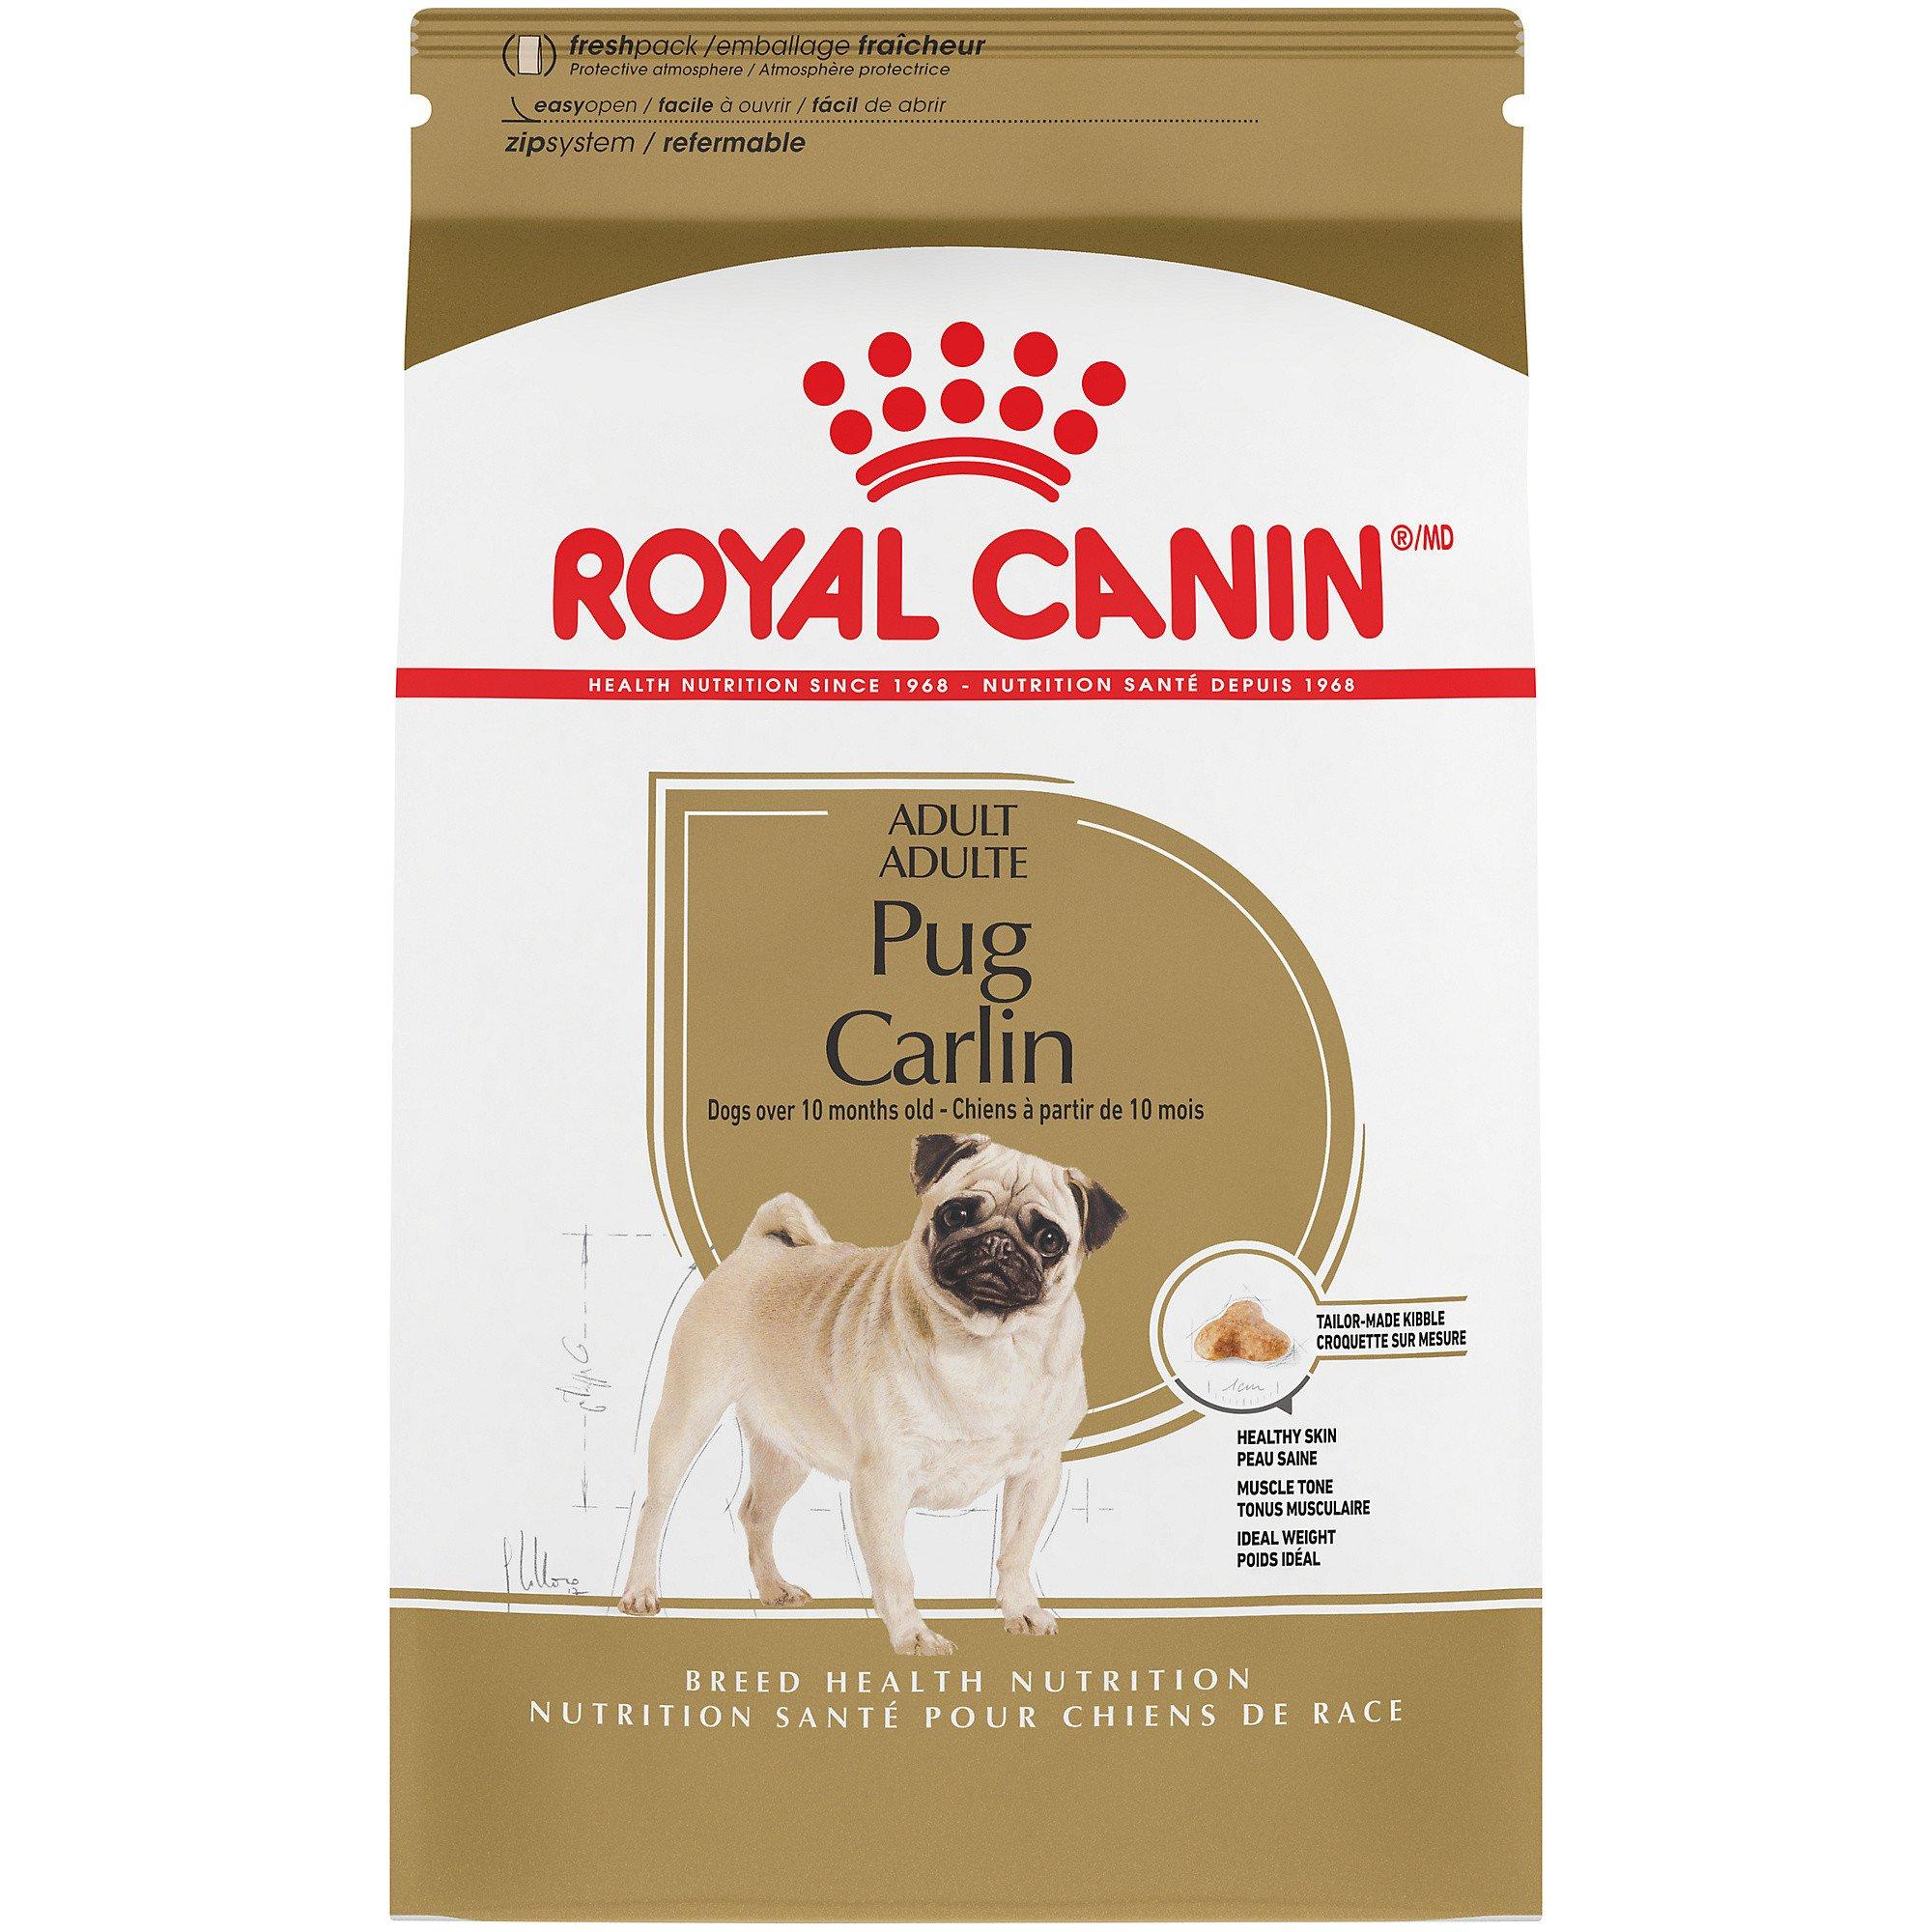 Royal Canin MINI Pug 25 Dry Dog Food